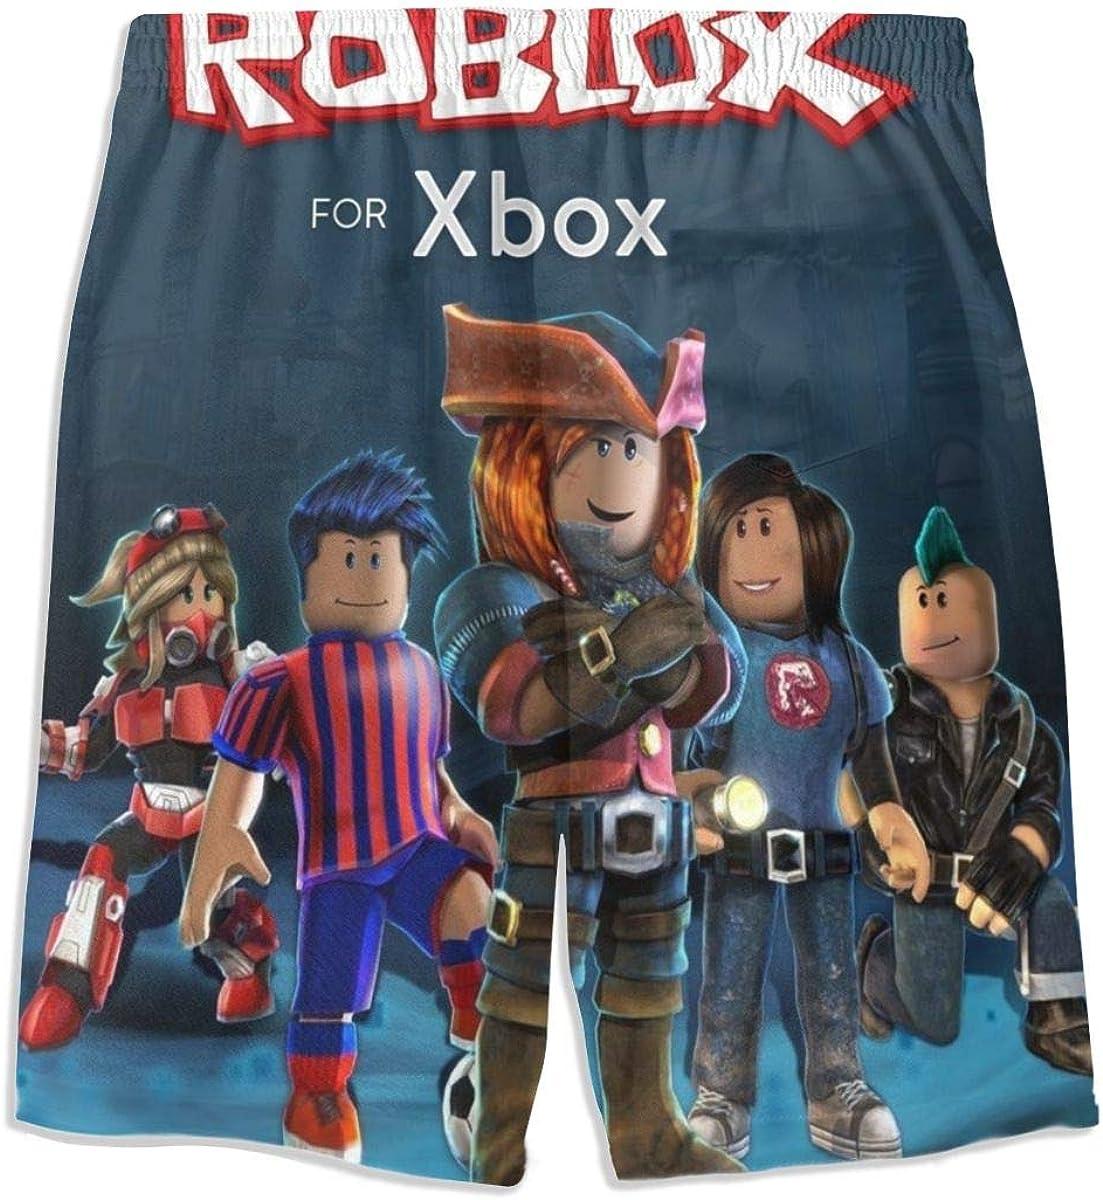 1507 Rob-Lox Boys Swim Trunks Beach Shorts Board Shorts with Pockets for 7-20 Years